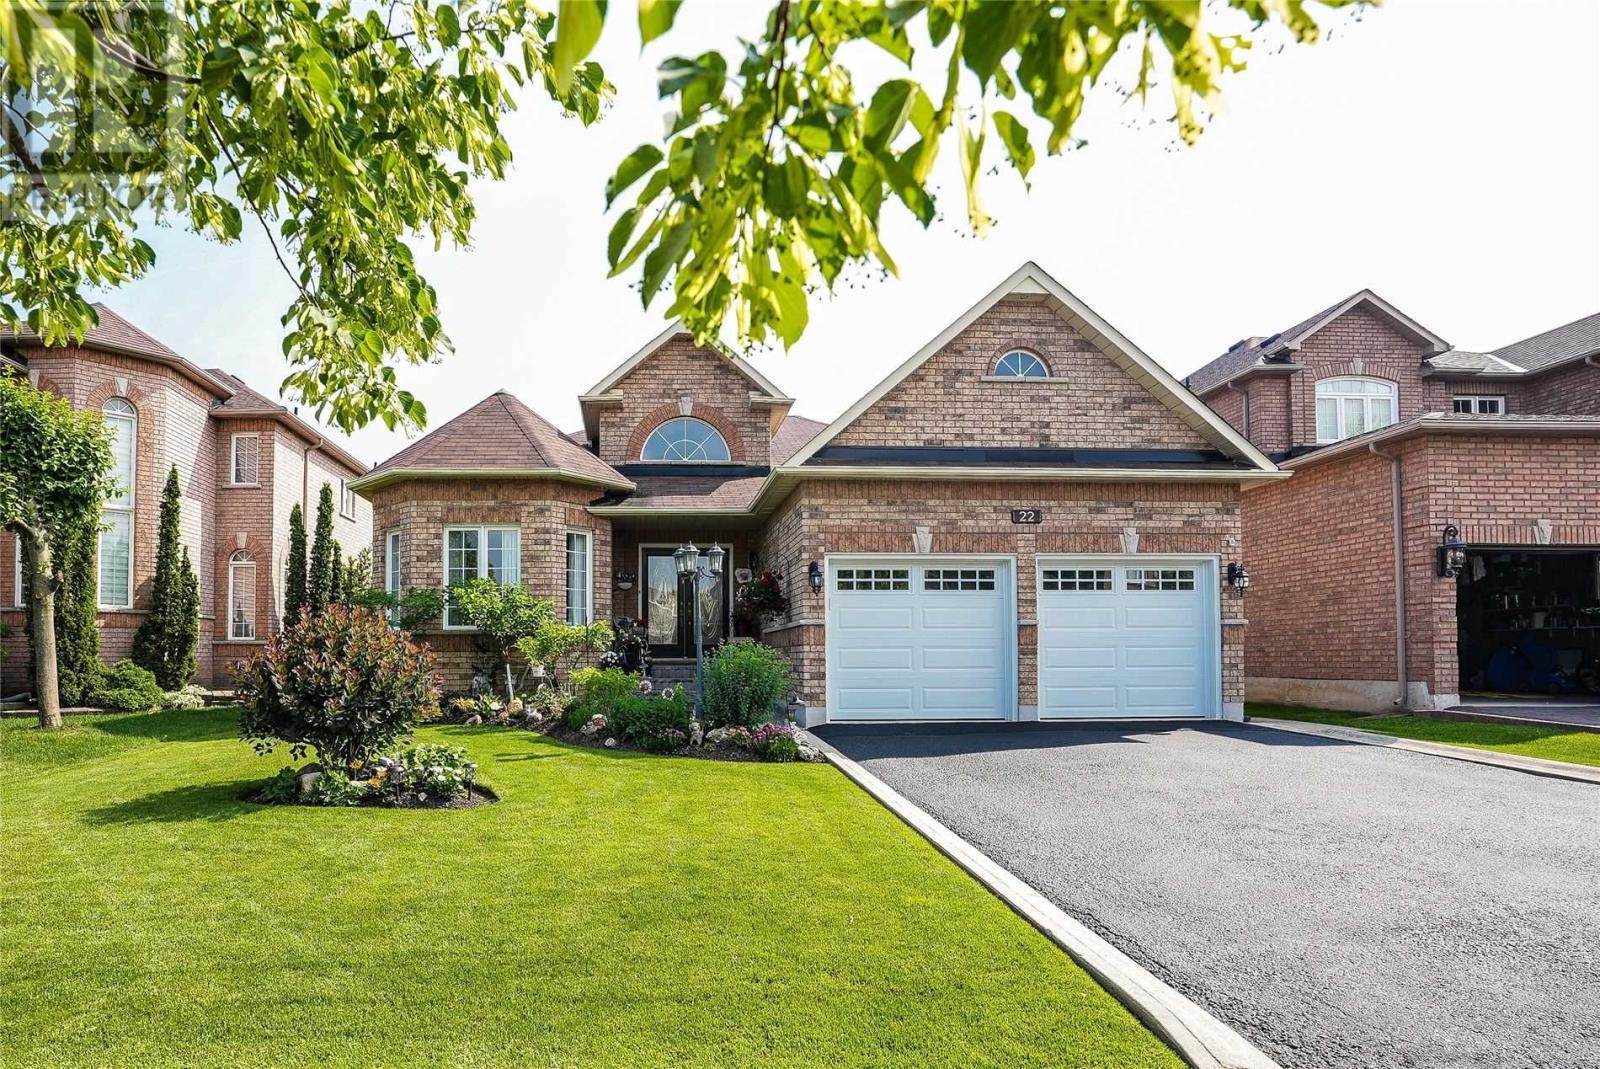 22 Robinson Rd, Halton Hills, Ontario  L7G 6G5 - Photo 2 - W5287864